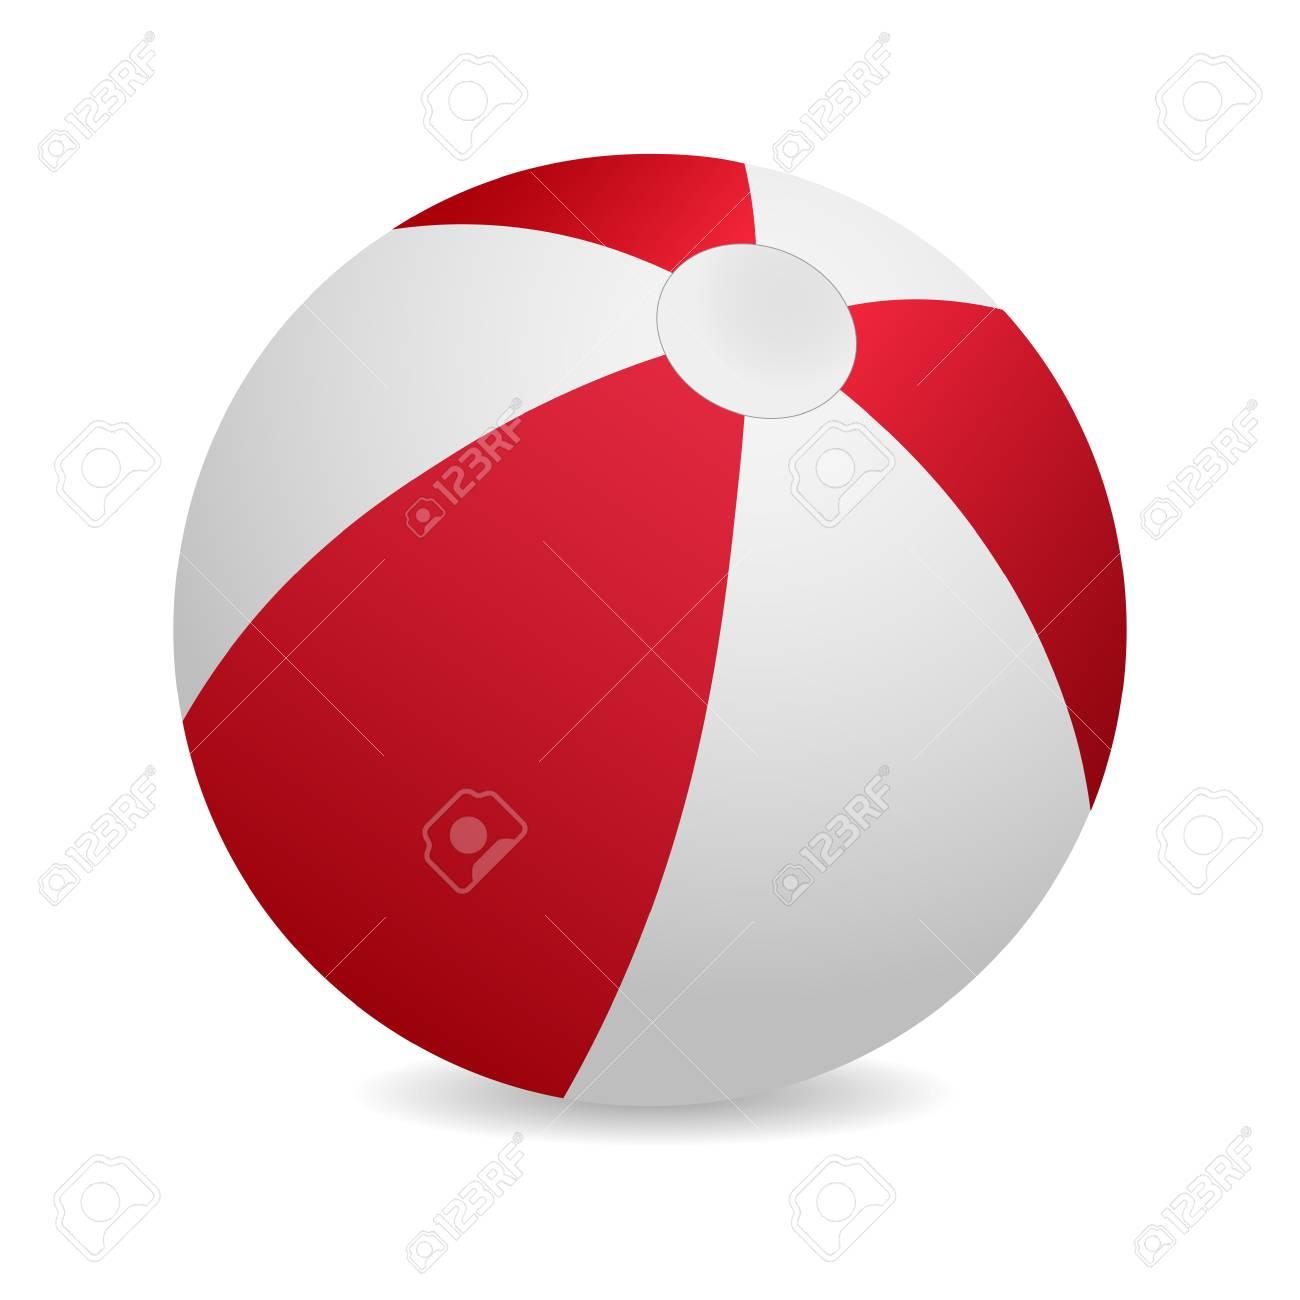 3d red beach ball vector illustration royalty free cliparts rh 123rf com beach volleyball ball vector beach ball vector icon